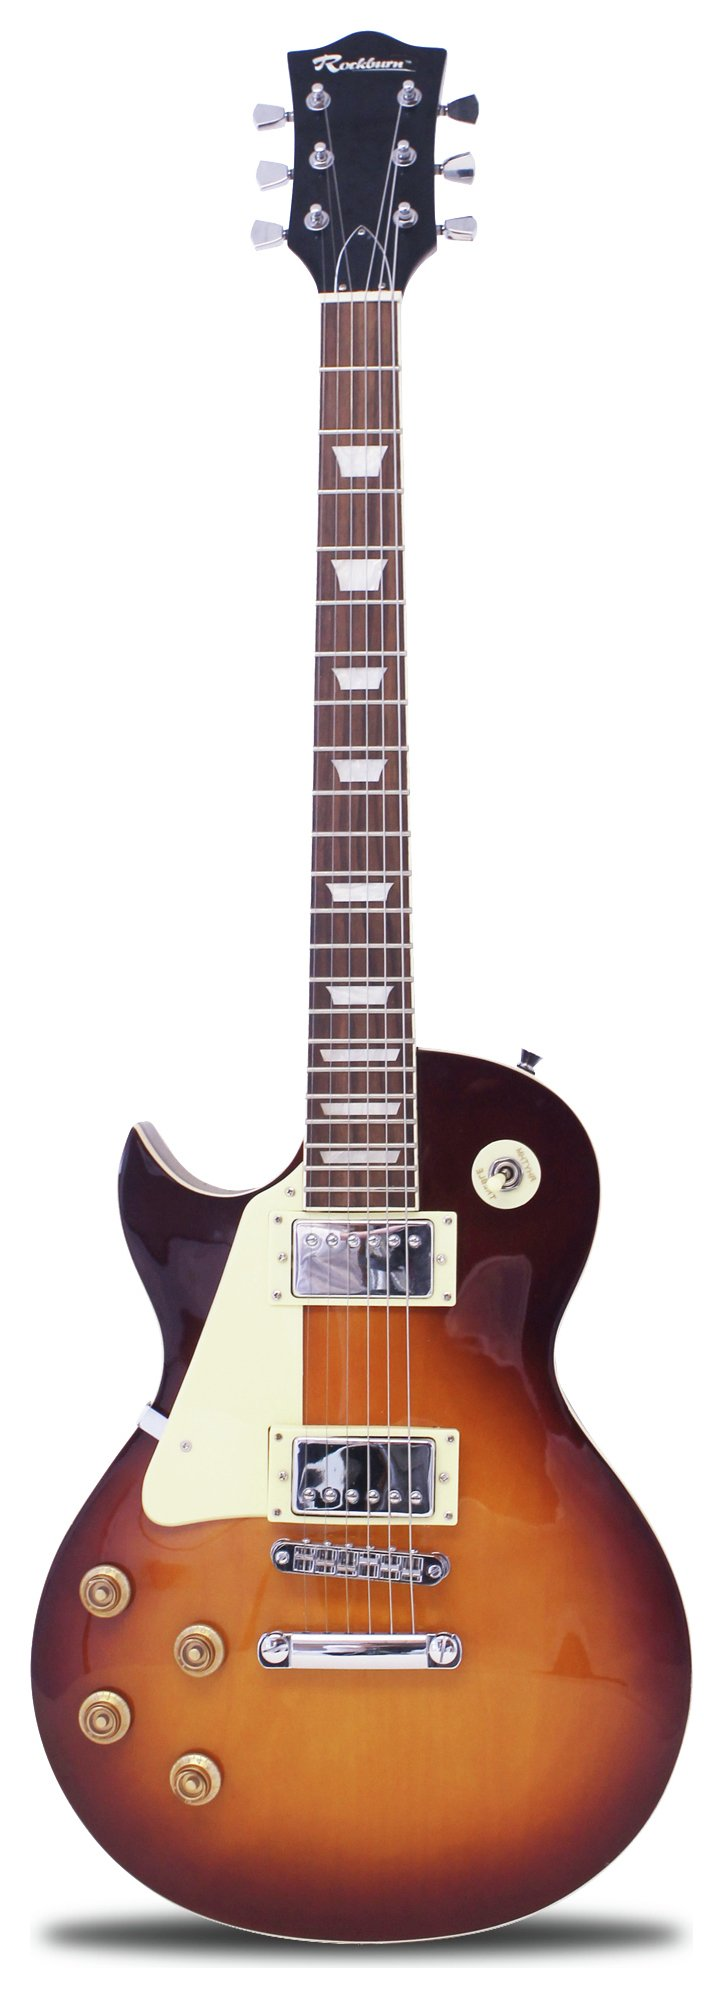 rockburn-lh-electric-guitar-sunburst